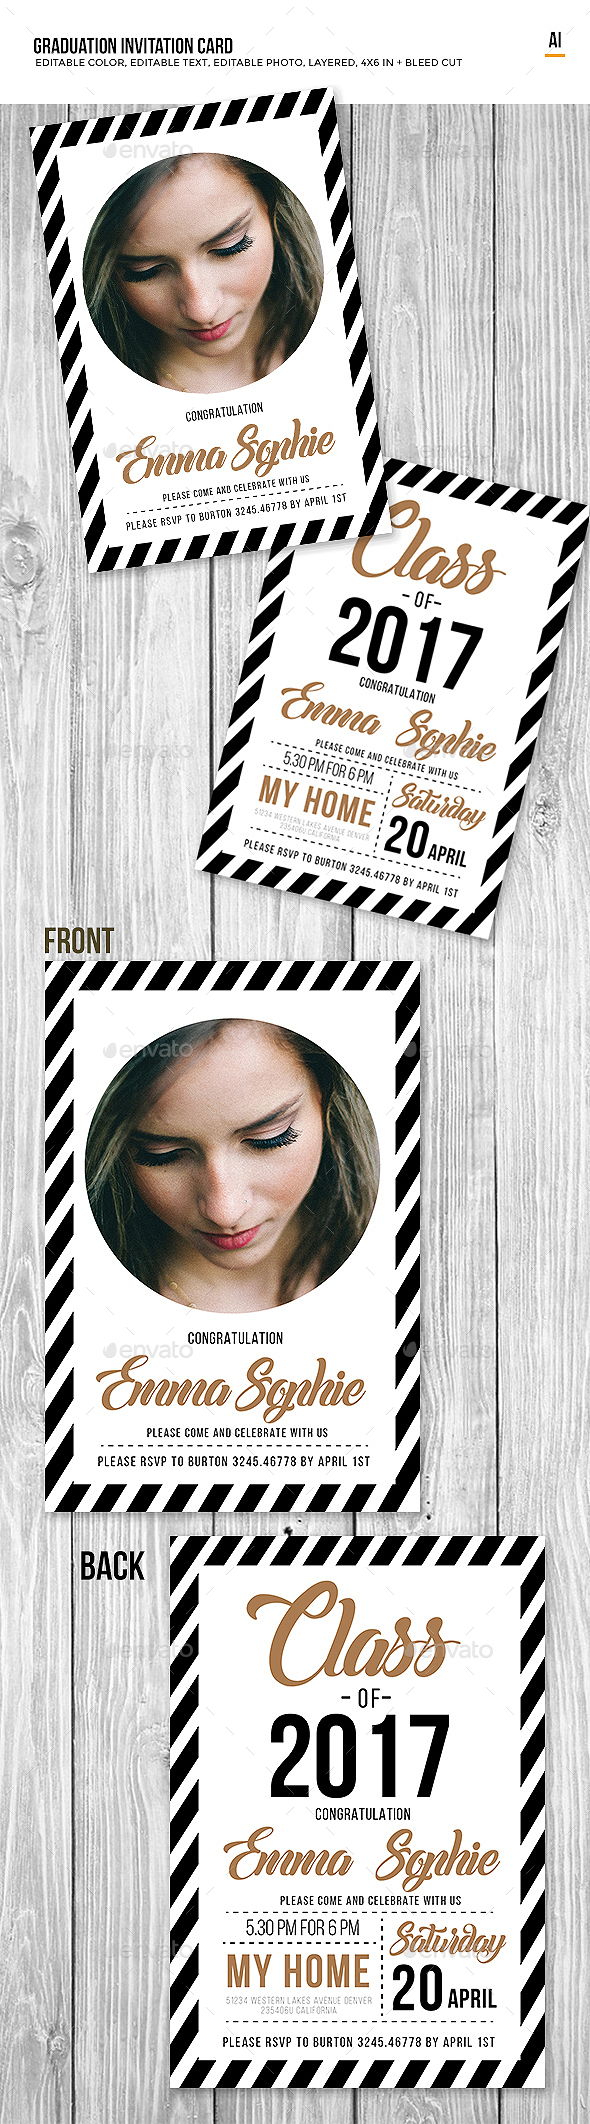 Graduation Invitation Card - Cards & Invites Print Templates